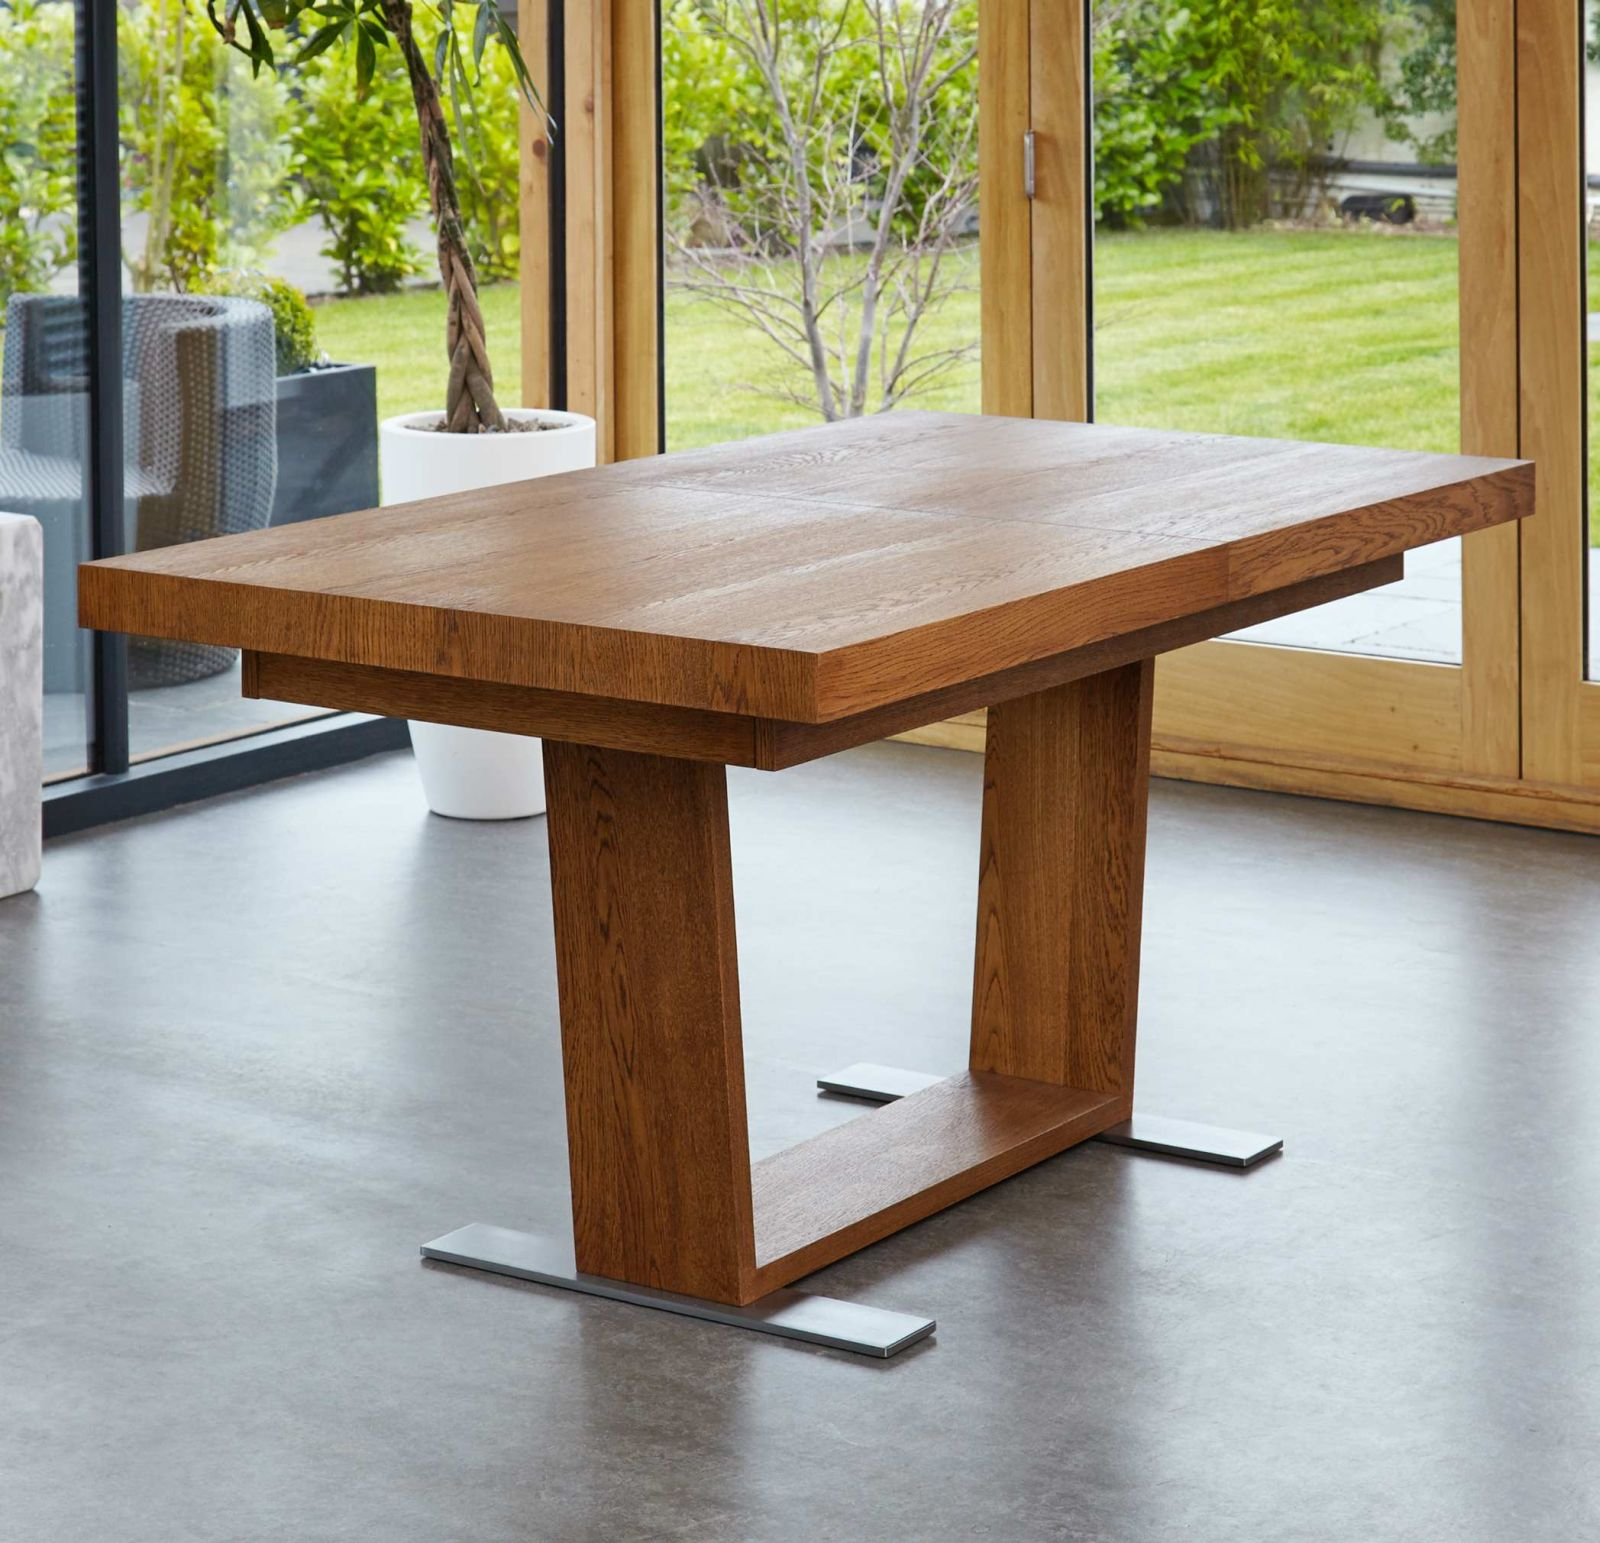 Olten Dark Oak Furniture Extra Large Extending Dining